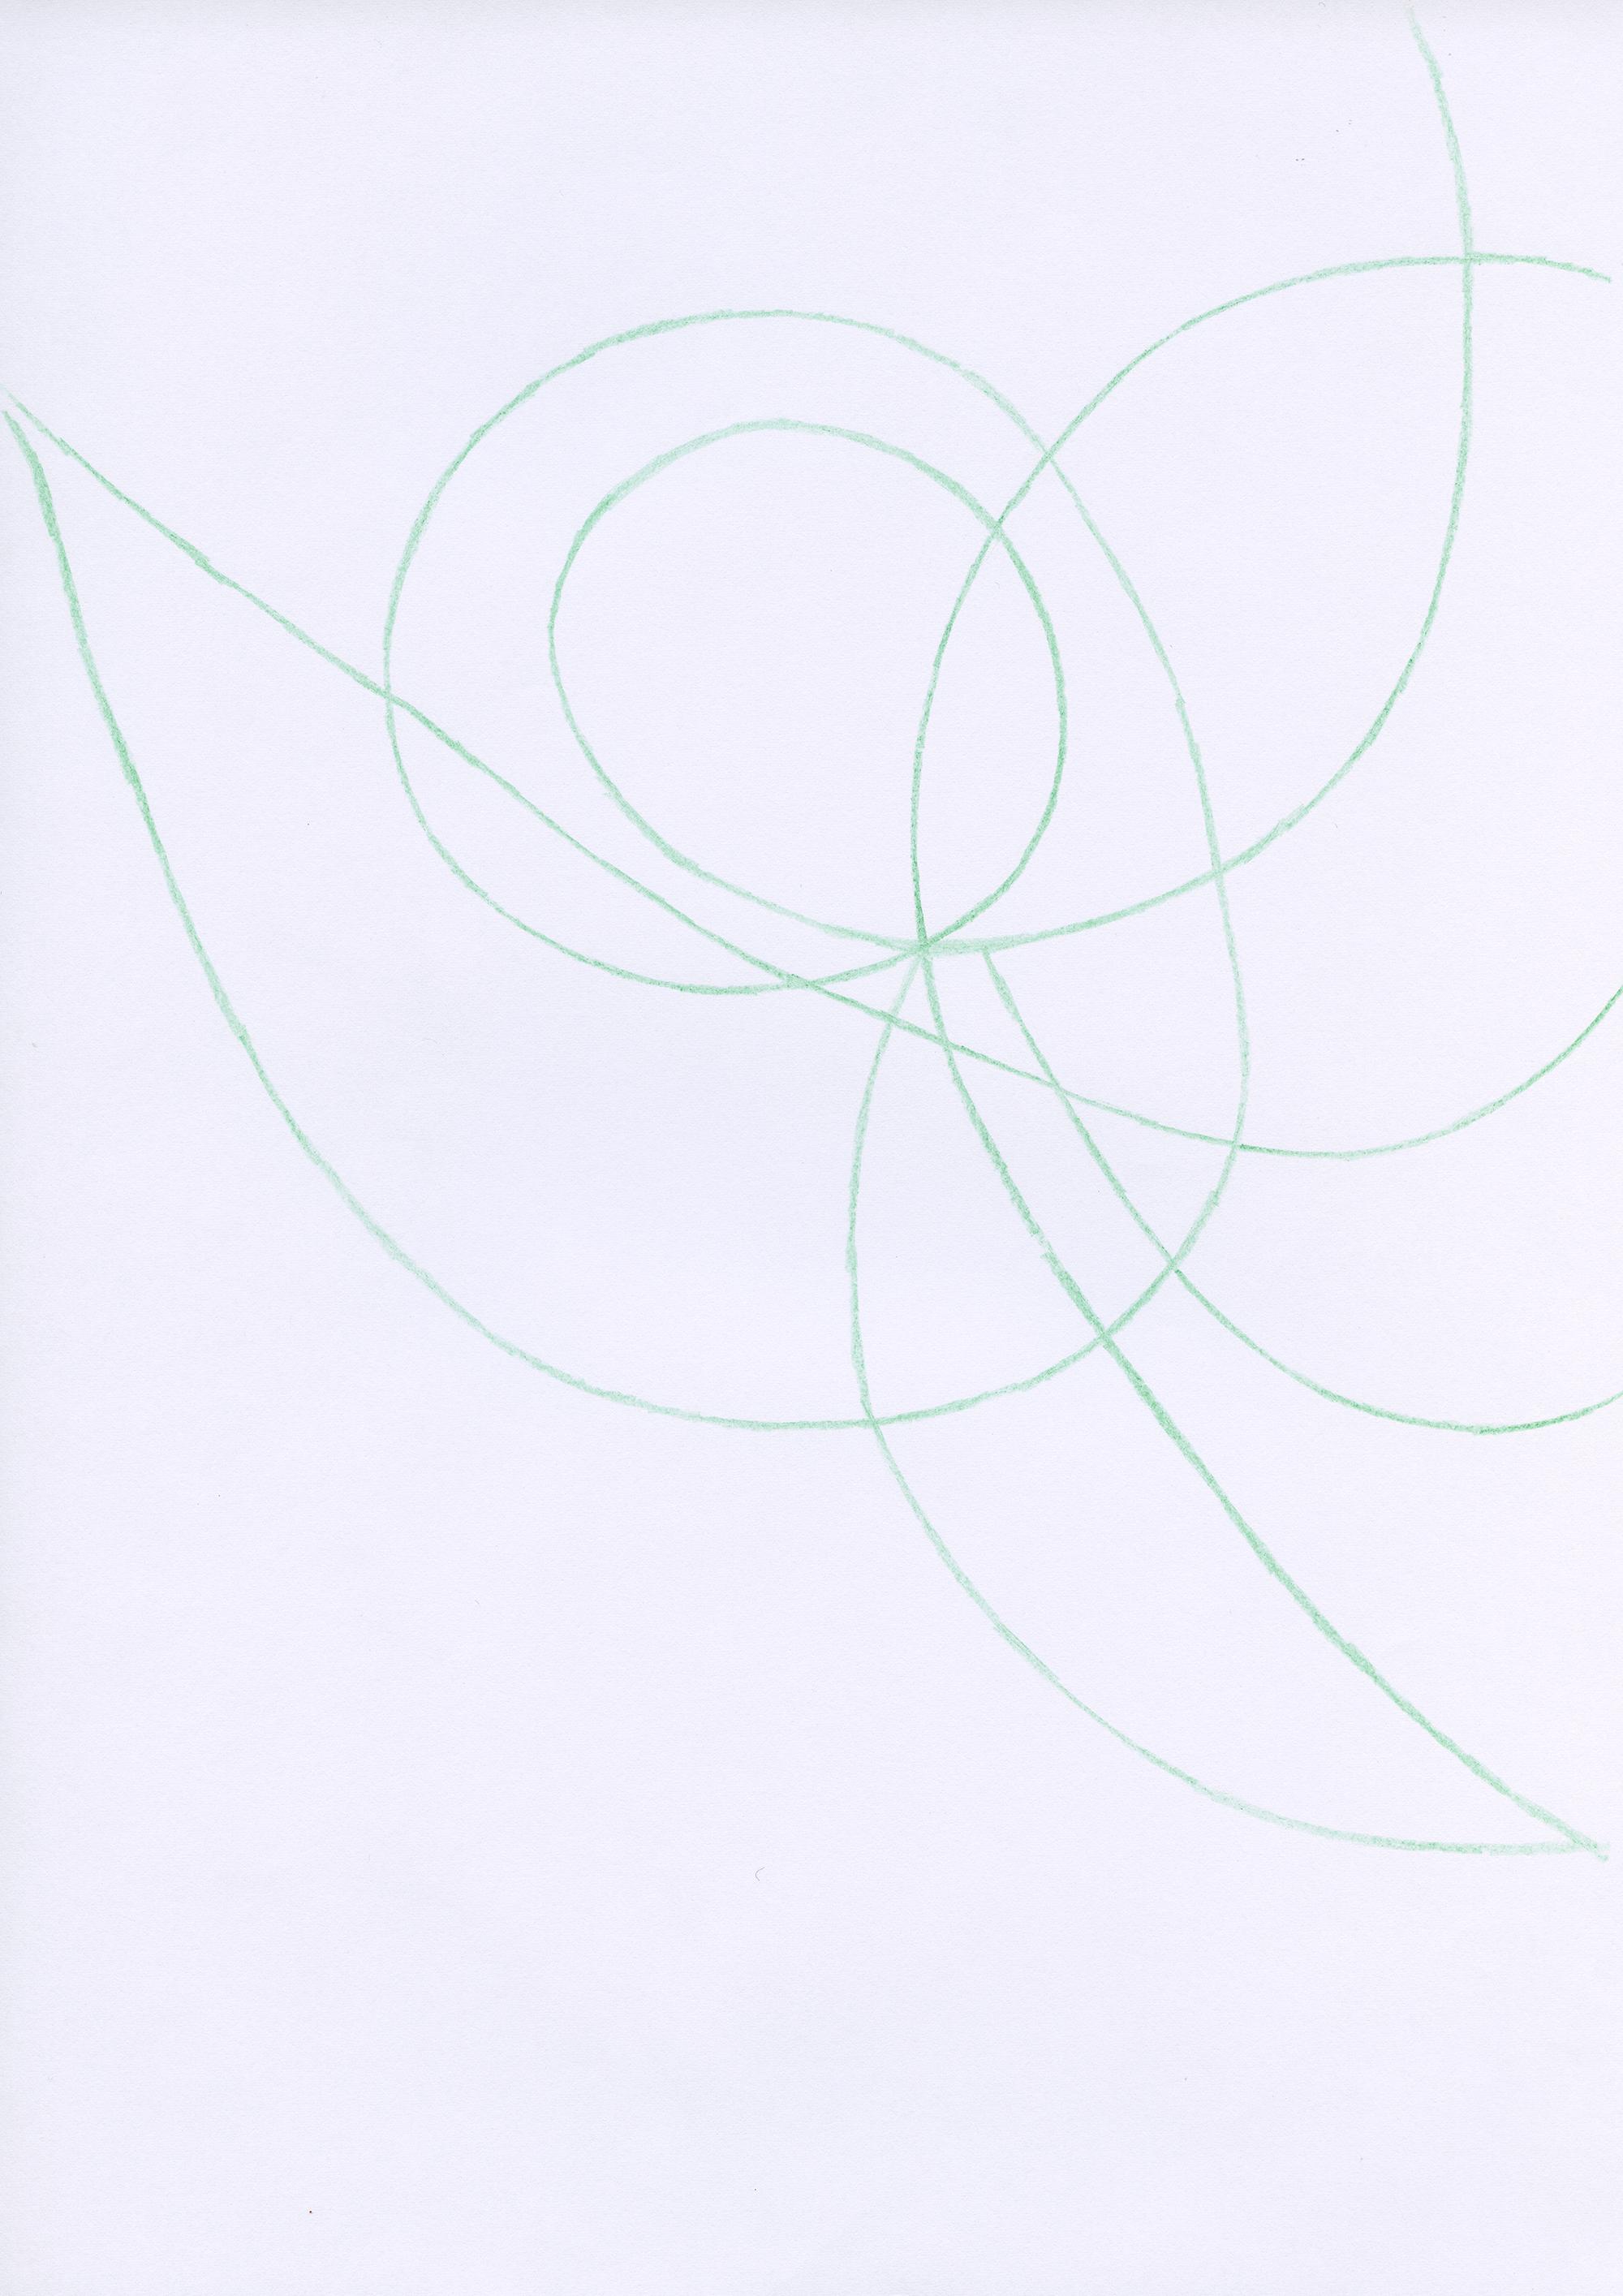 Untitled, 2007, color pencil on paper, 21 x 29,7 cm